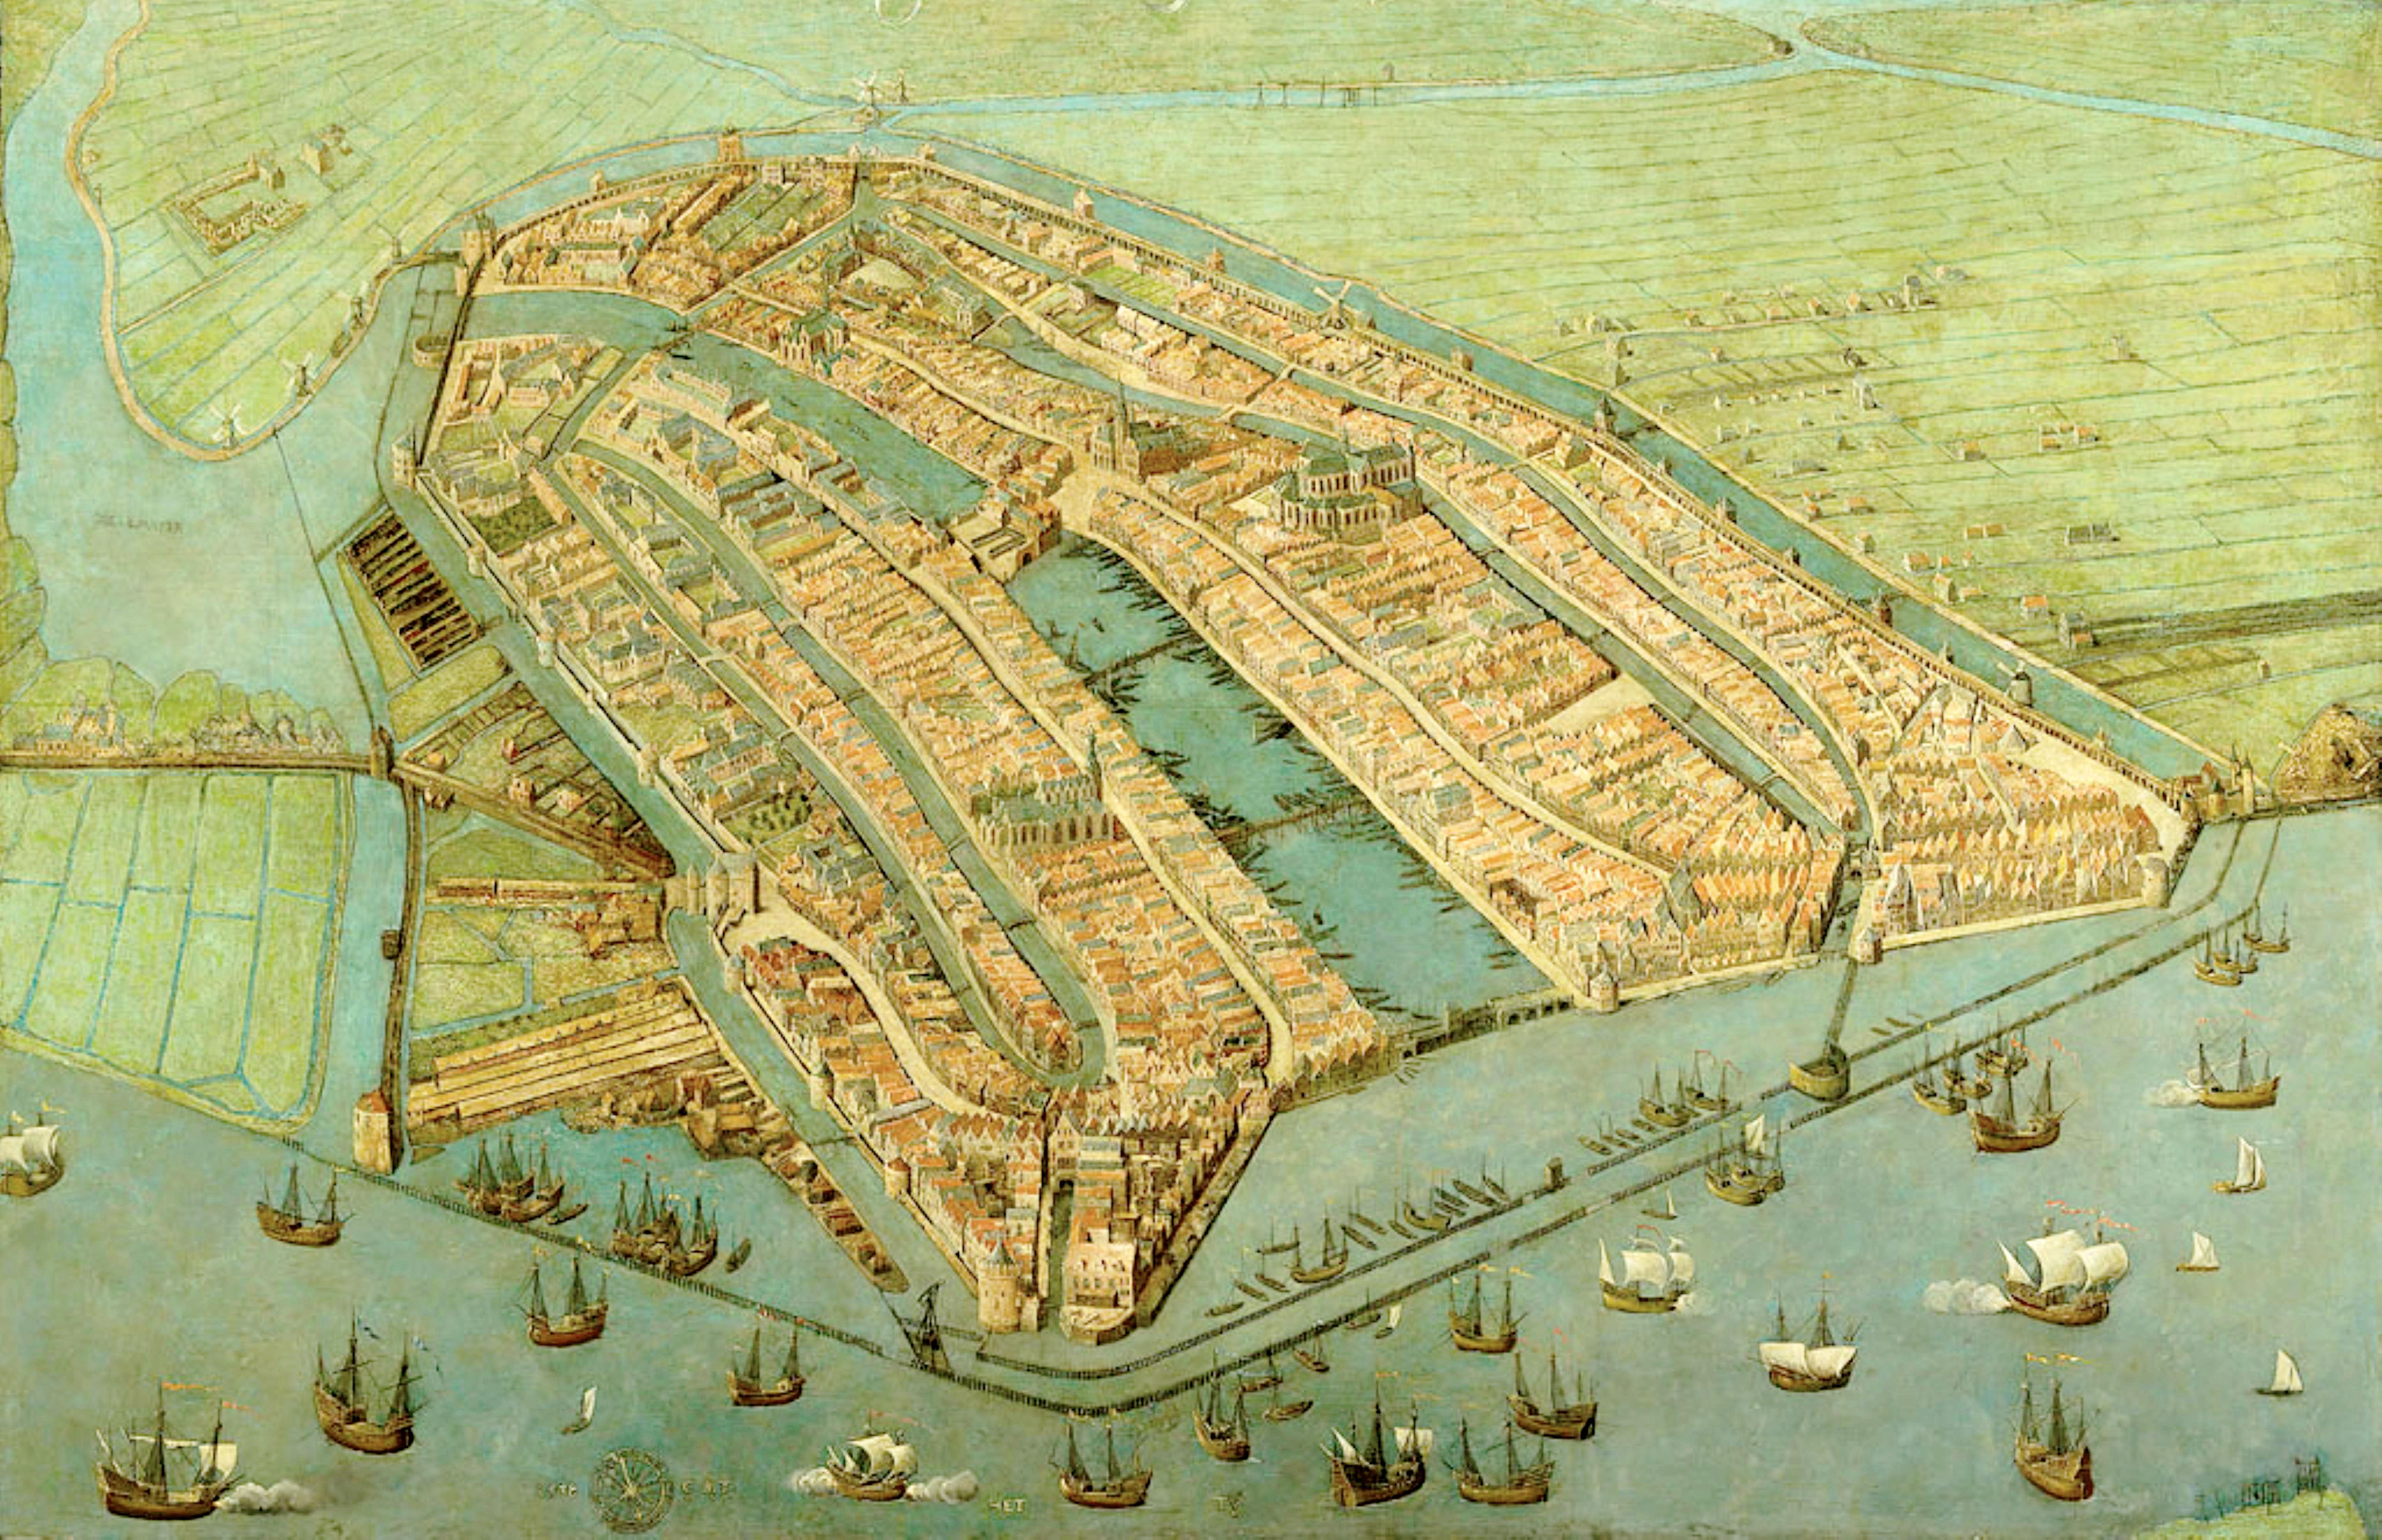 File:Amsterdam in 1538.JPG